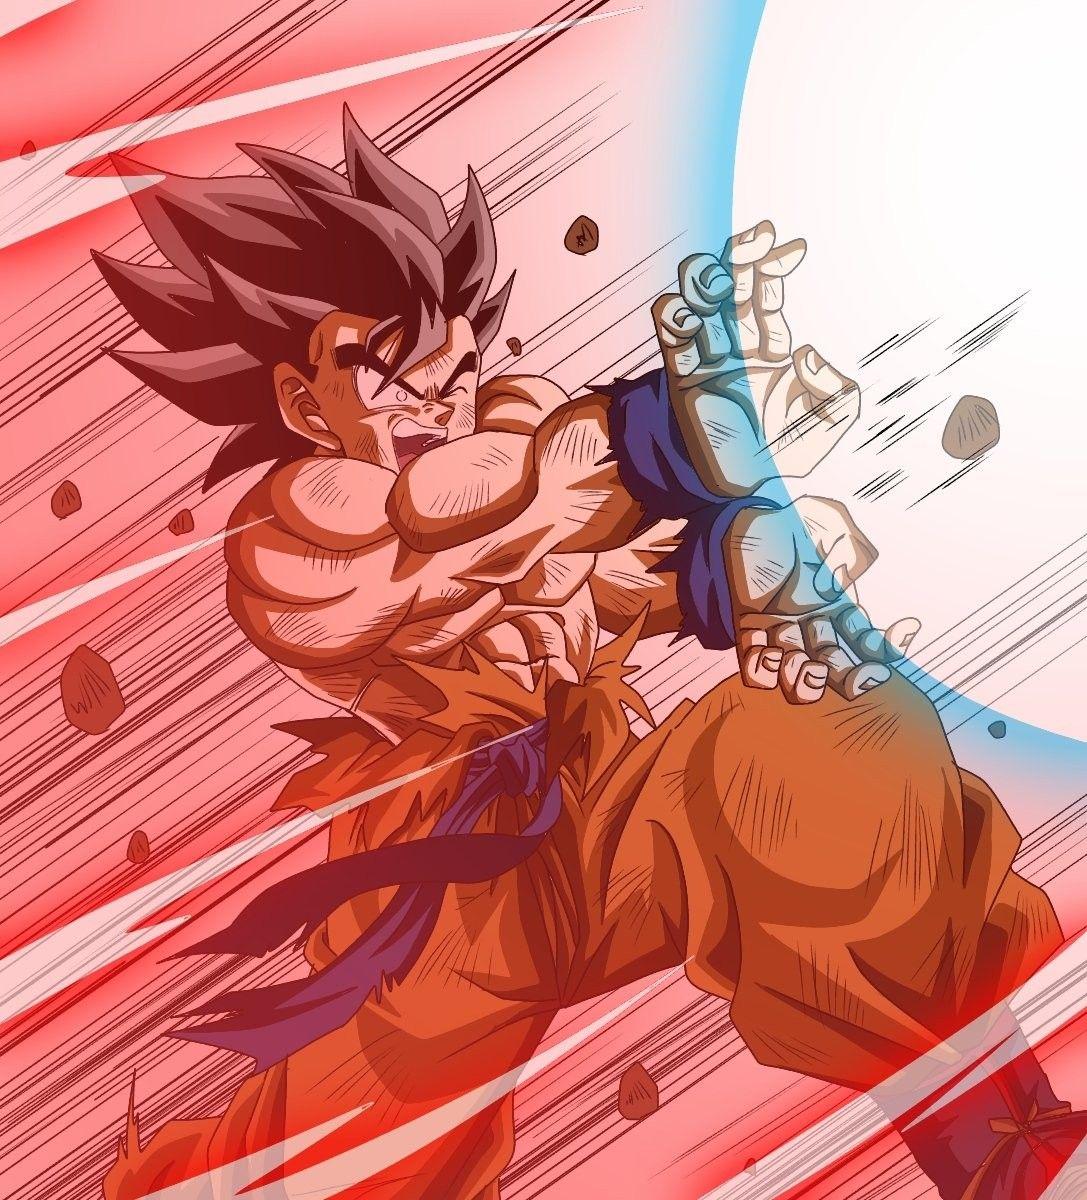 Goku Con Kaioken Haciendo Un Kamehameha Anime Dragon Ball Super Dragon Ball Super Goku Anime Dragon Ball